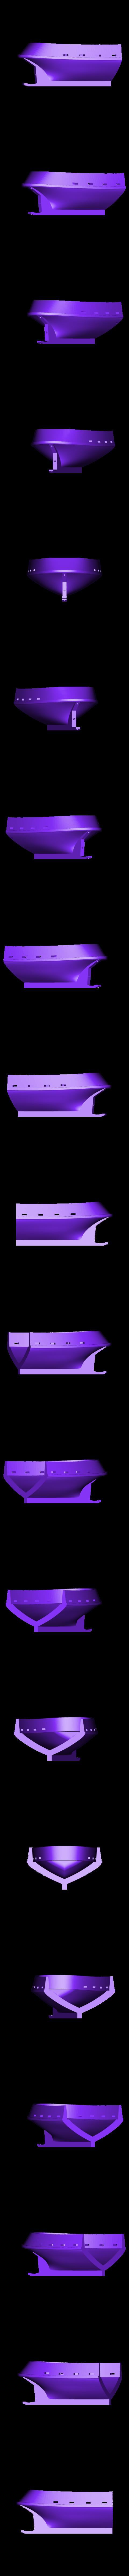 tug_hull2.stl Download free STL file Barge with Tugboat • 3D print object, Kajdalon